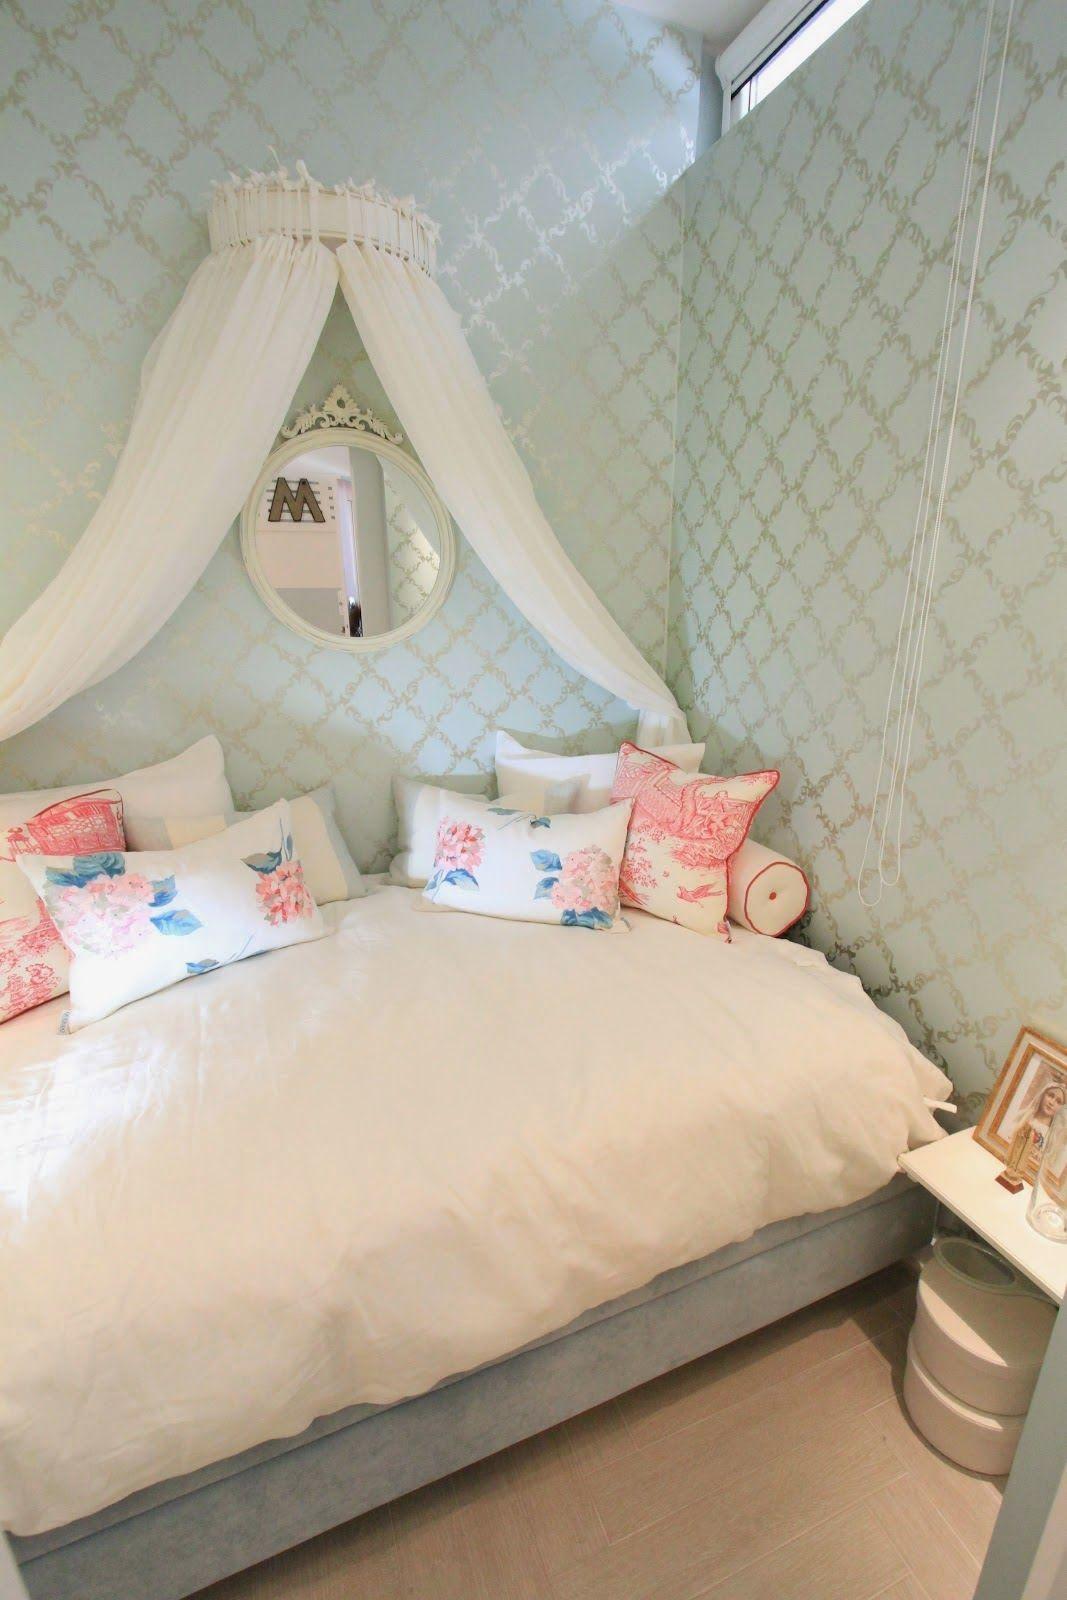 A cute girlsu0027 room setup Kid Threeu0027s